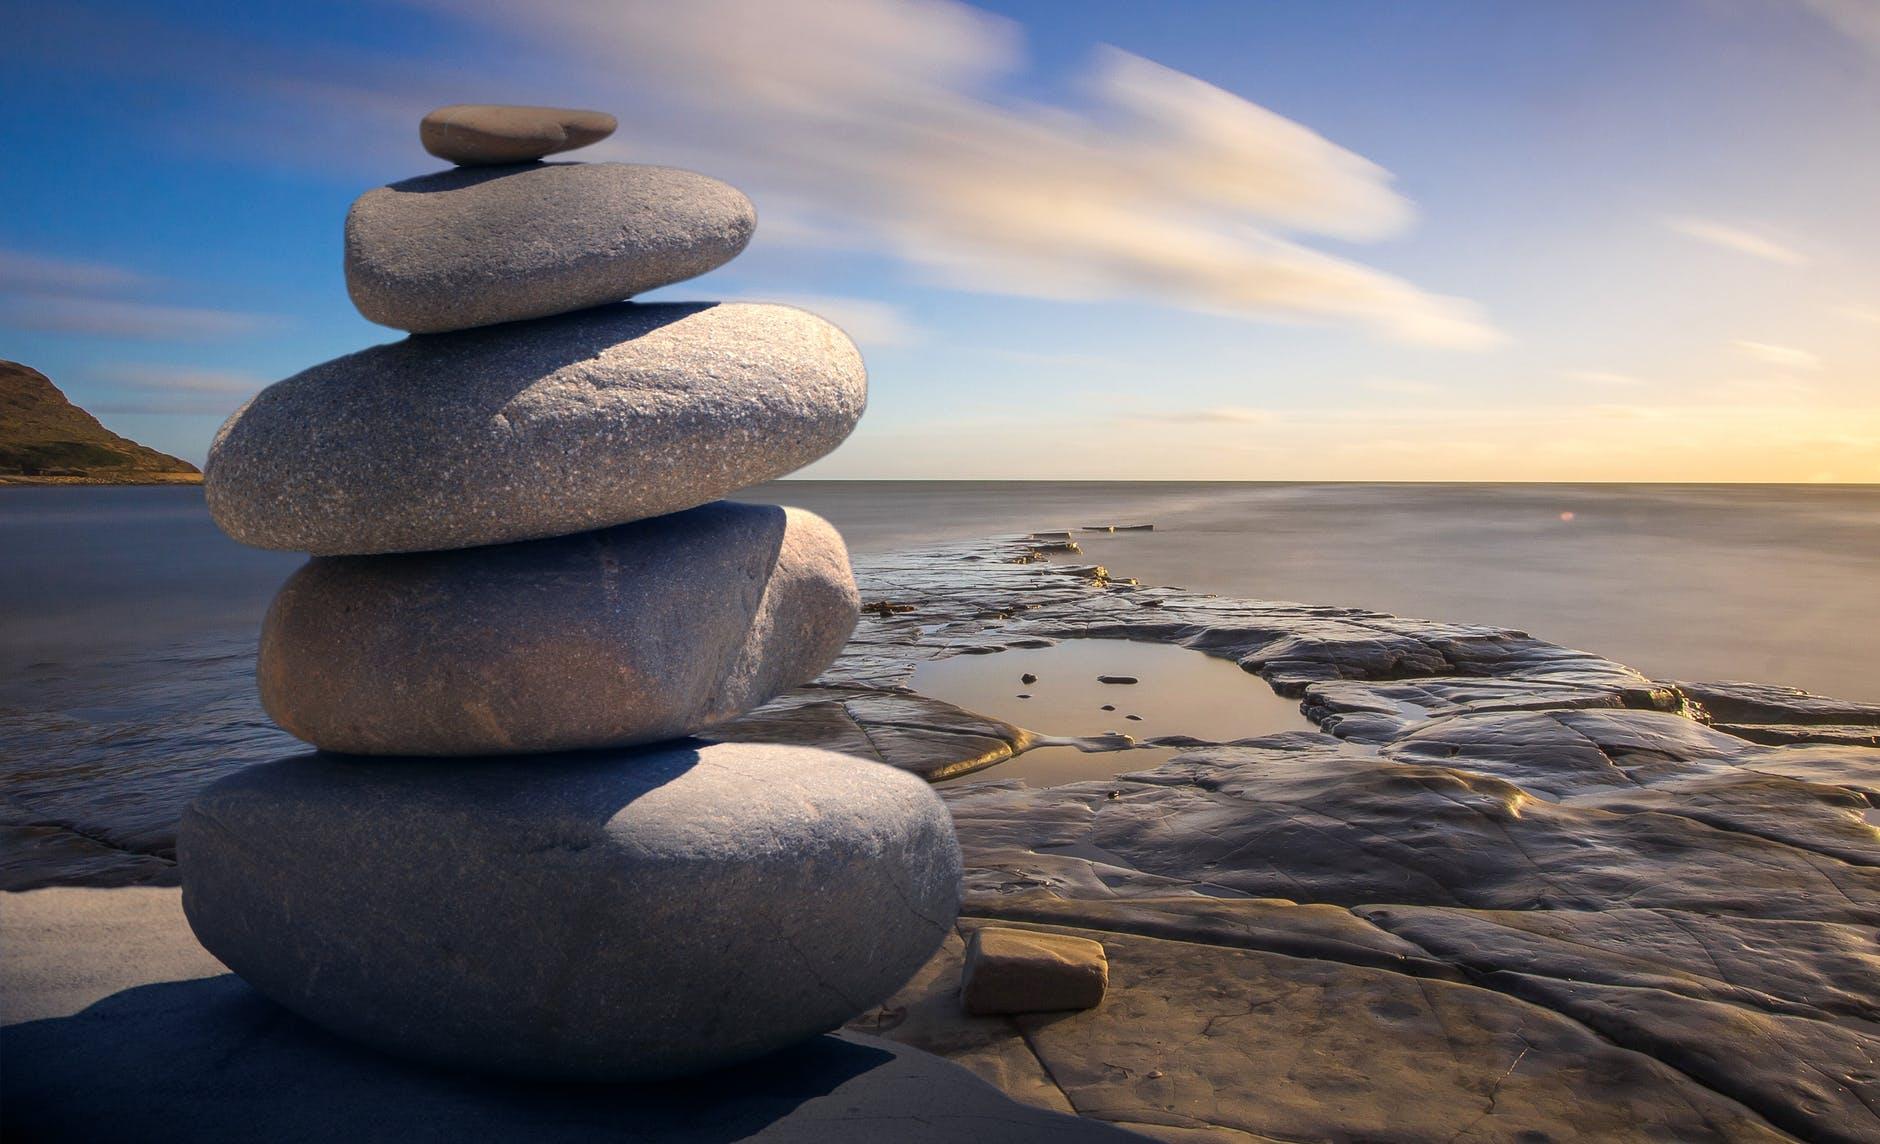 background balance beach boulder